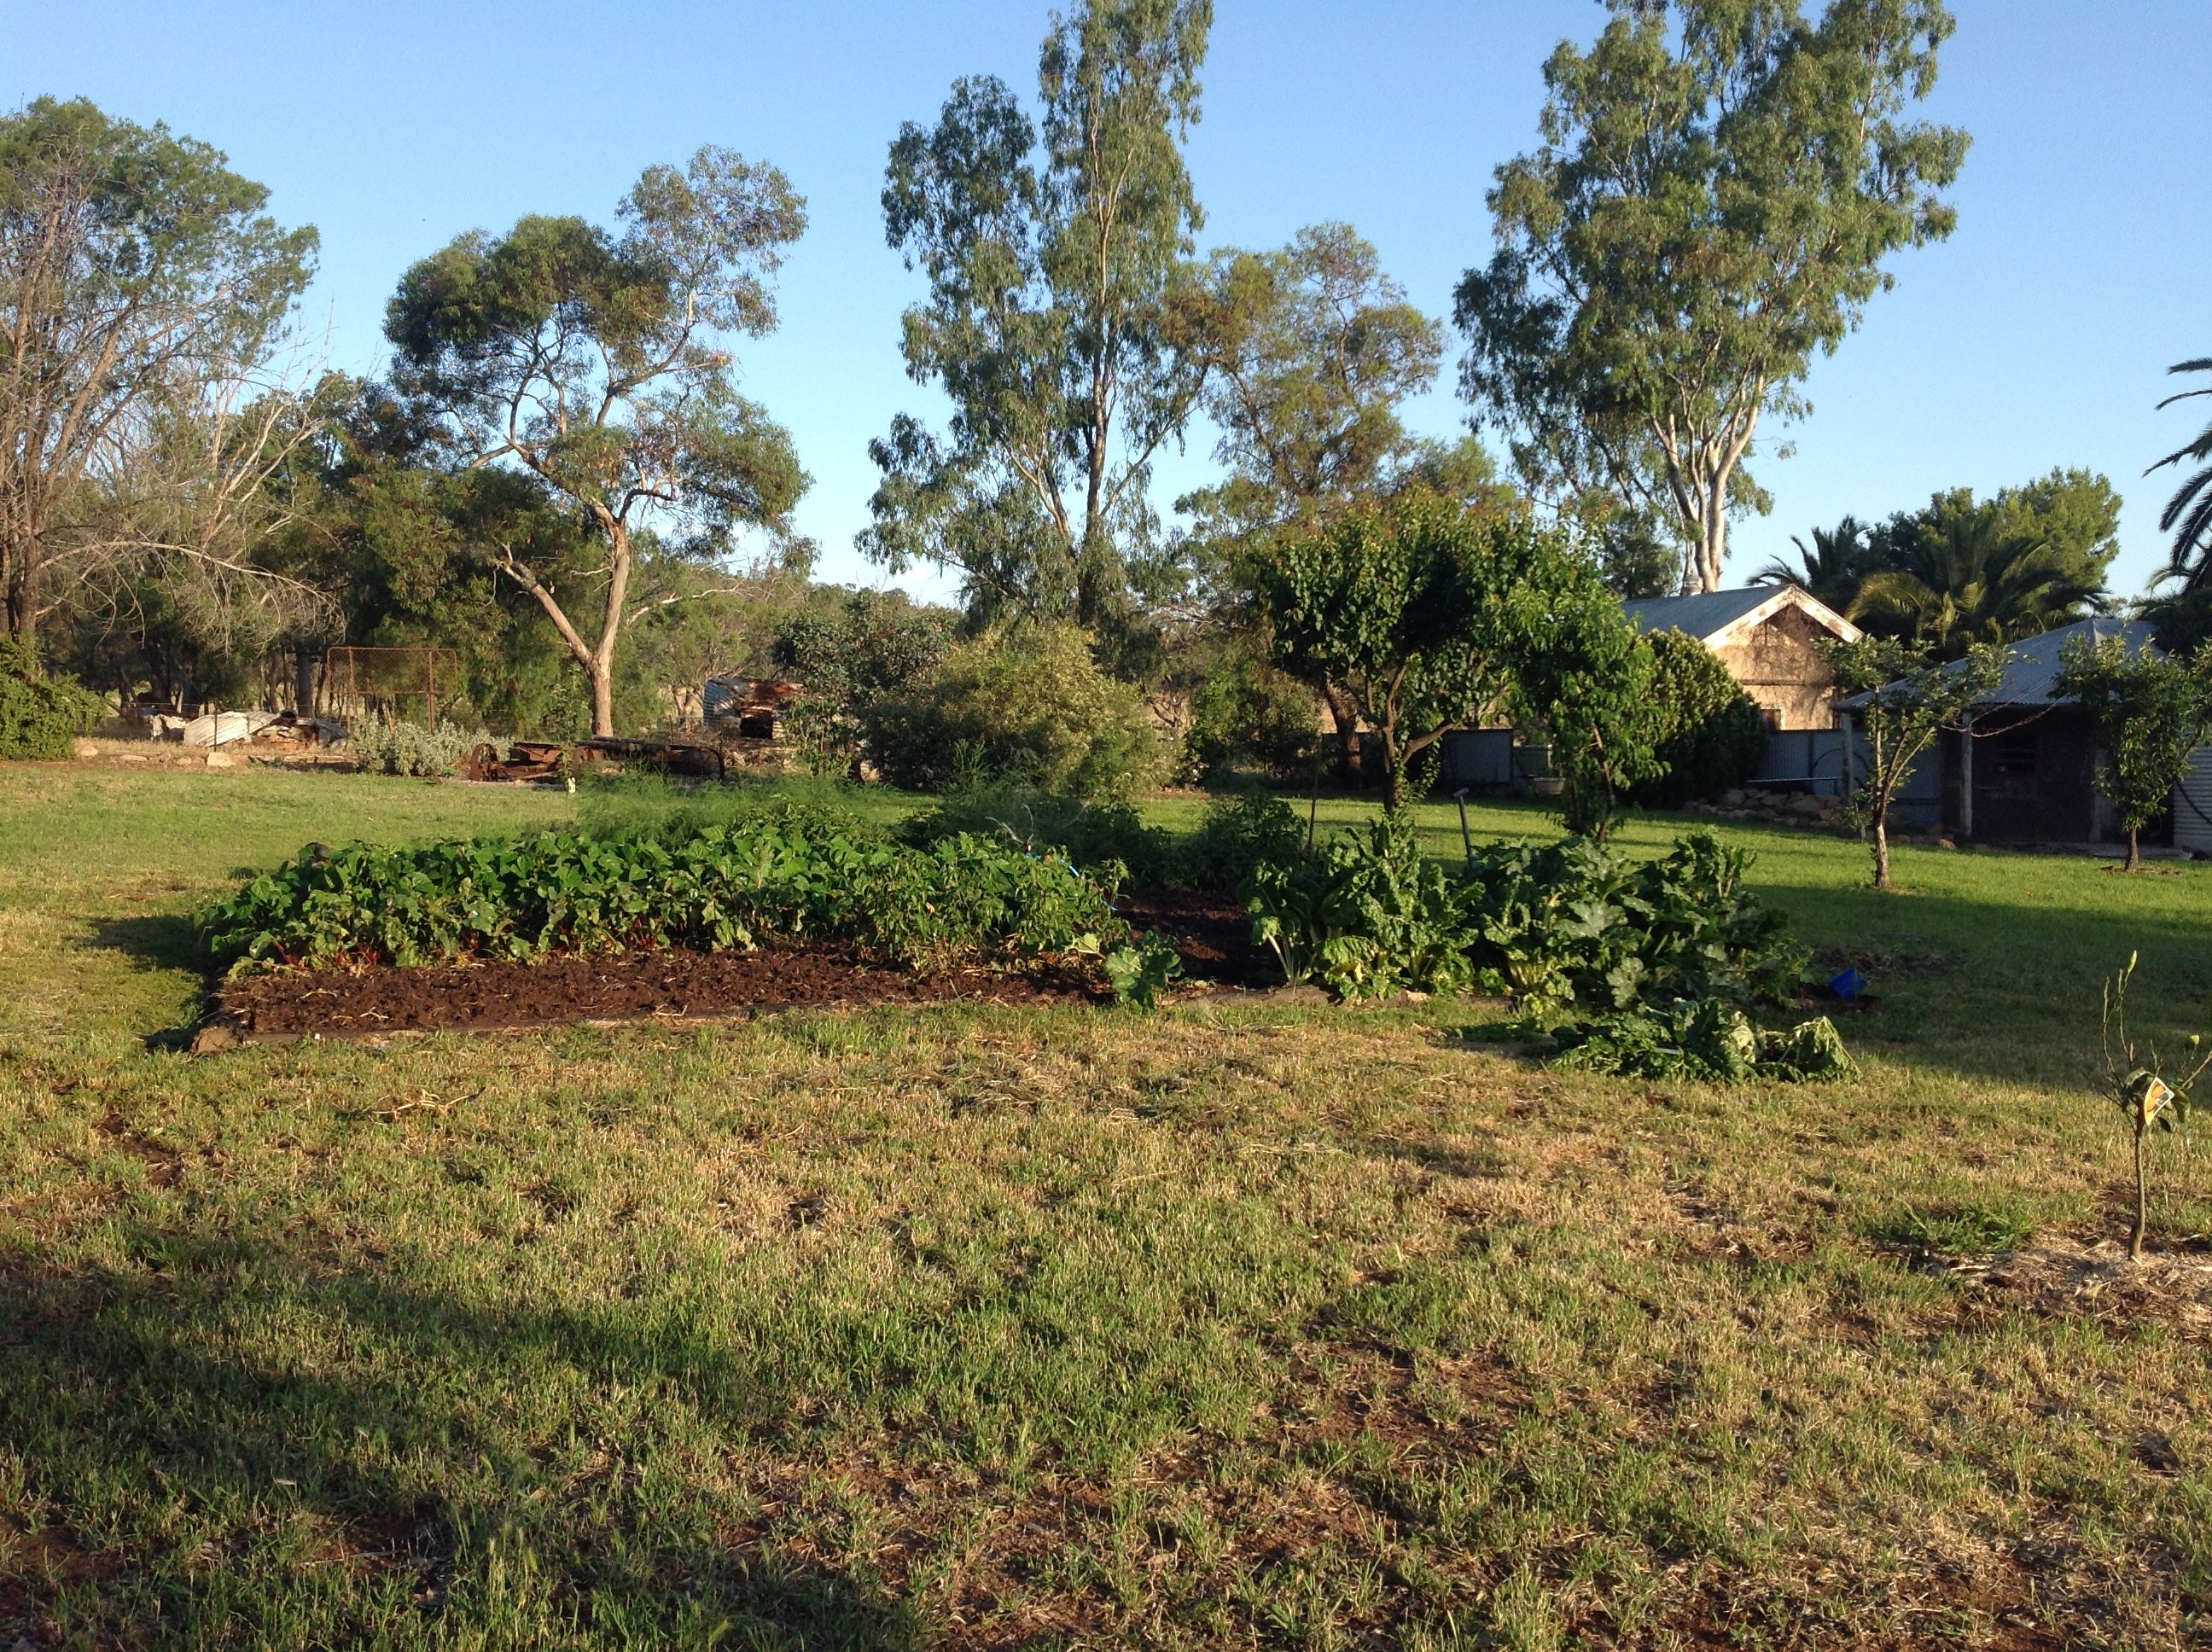 Backyard vehicle garden